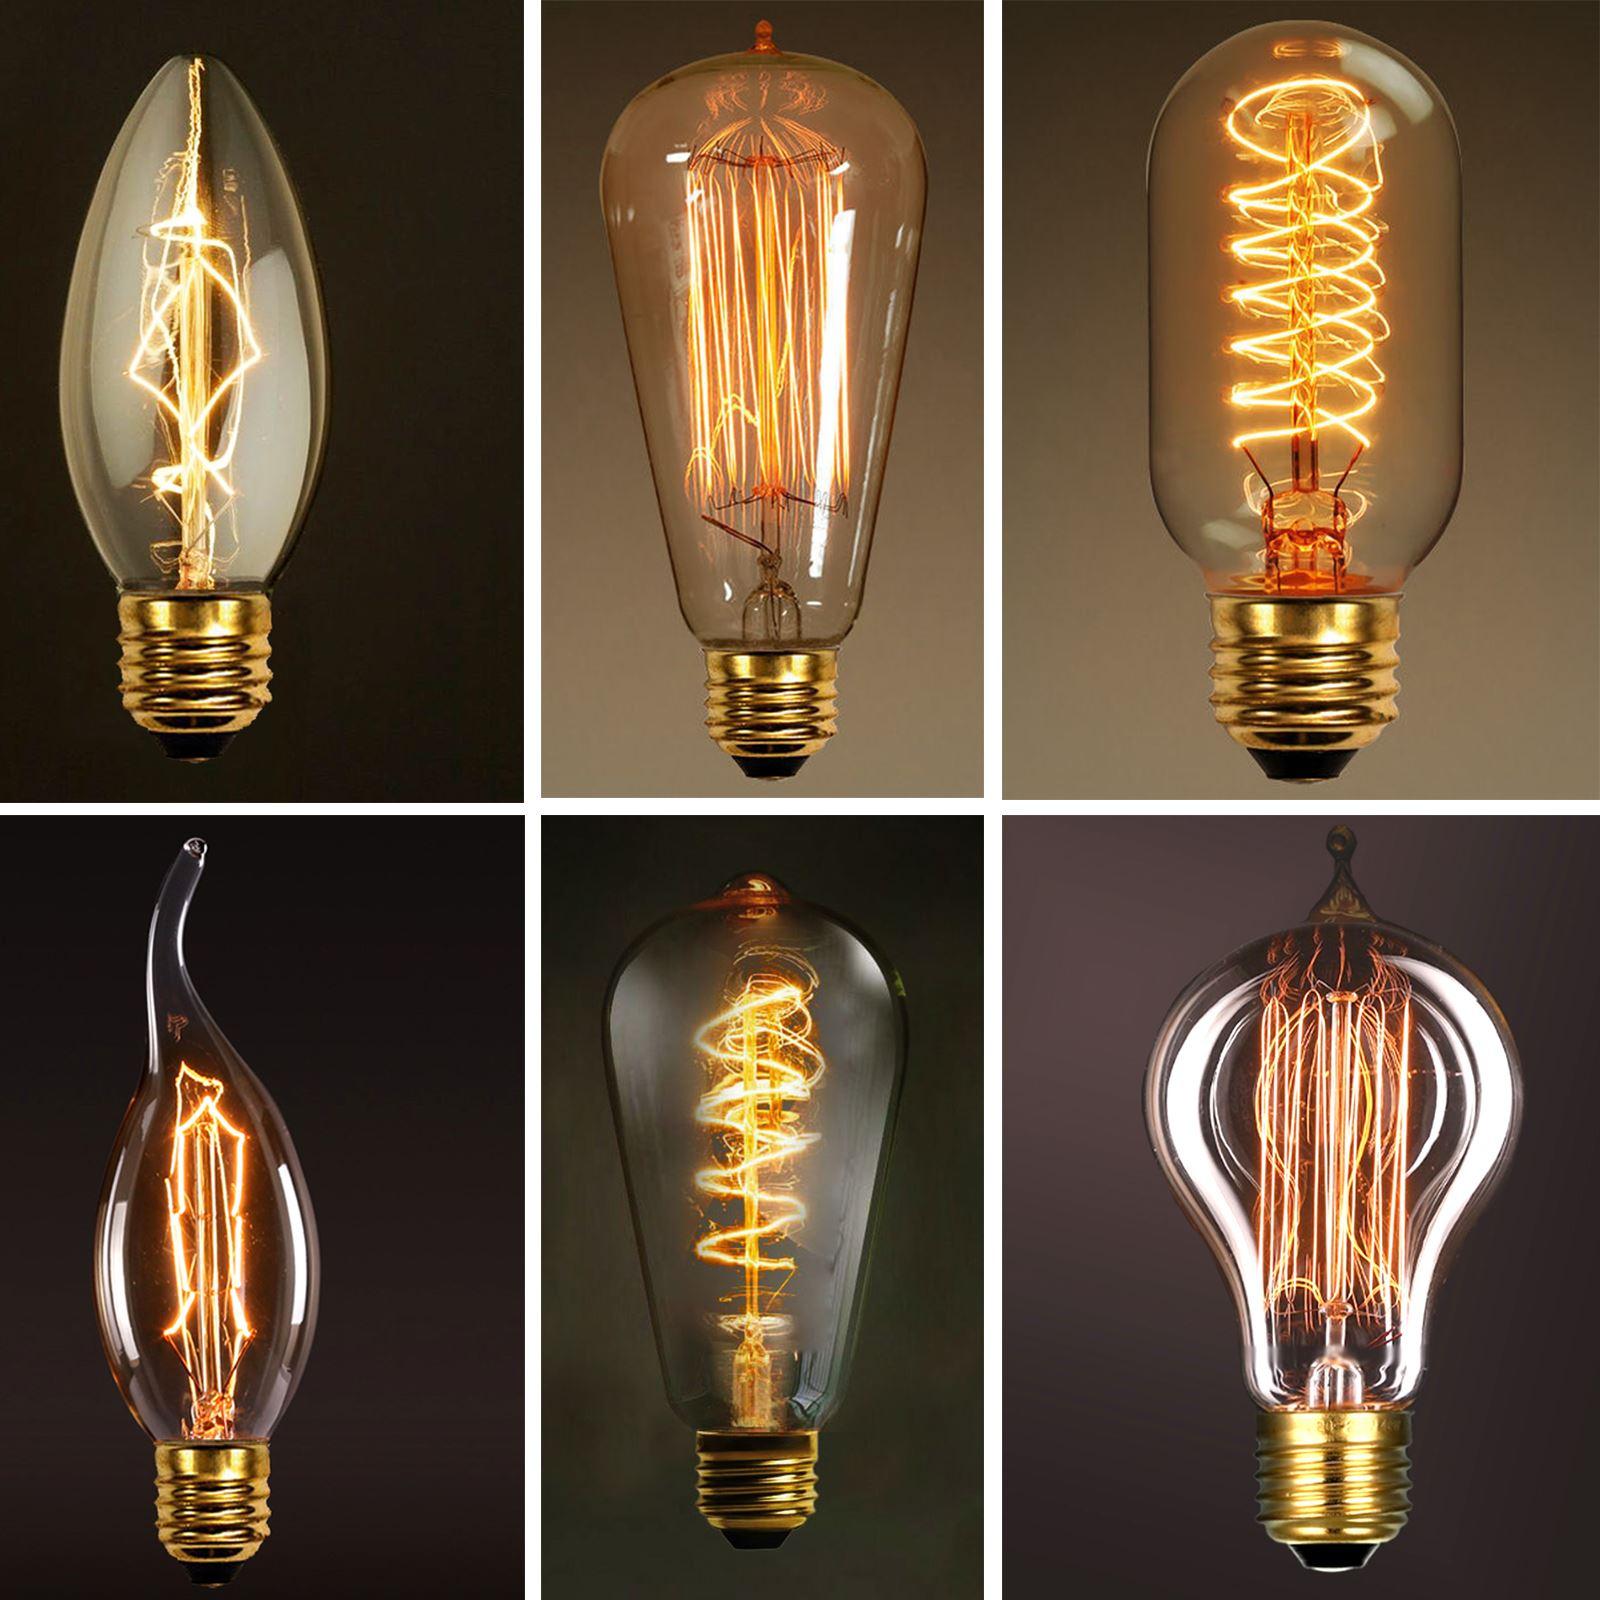 antique lamps vintage bulbs retro edison decorative lights. Black Bedroom Furniture Sets. Home Design Ideas